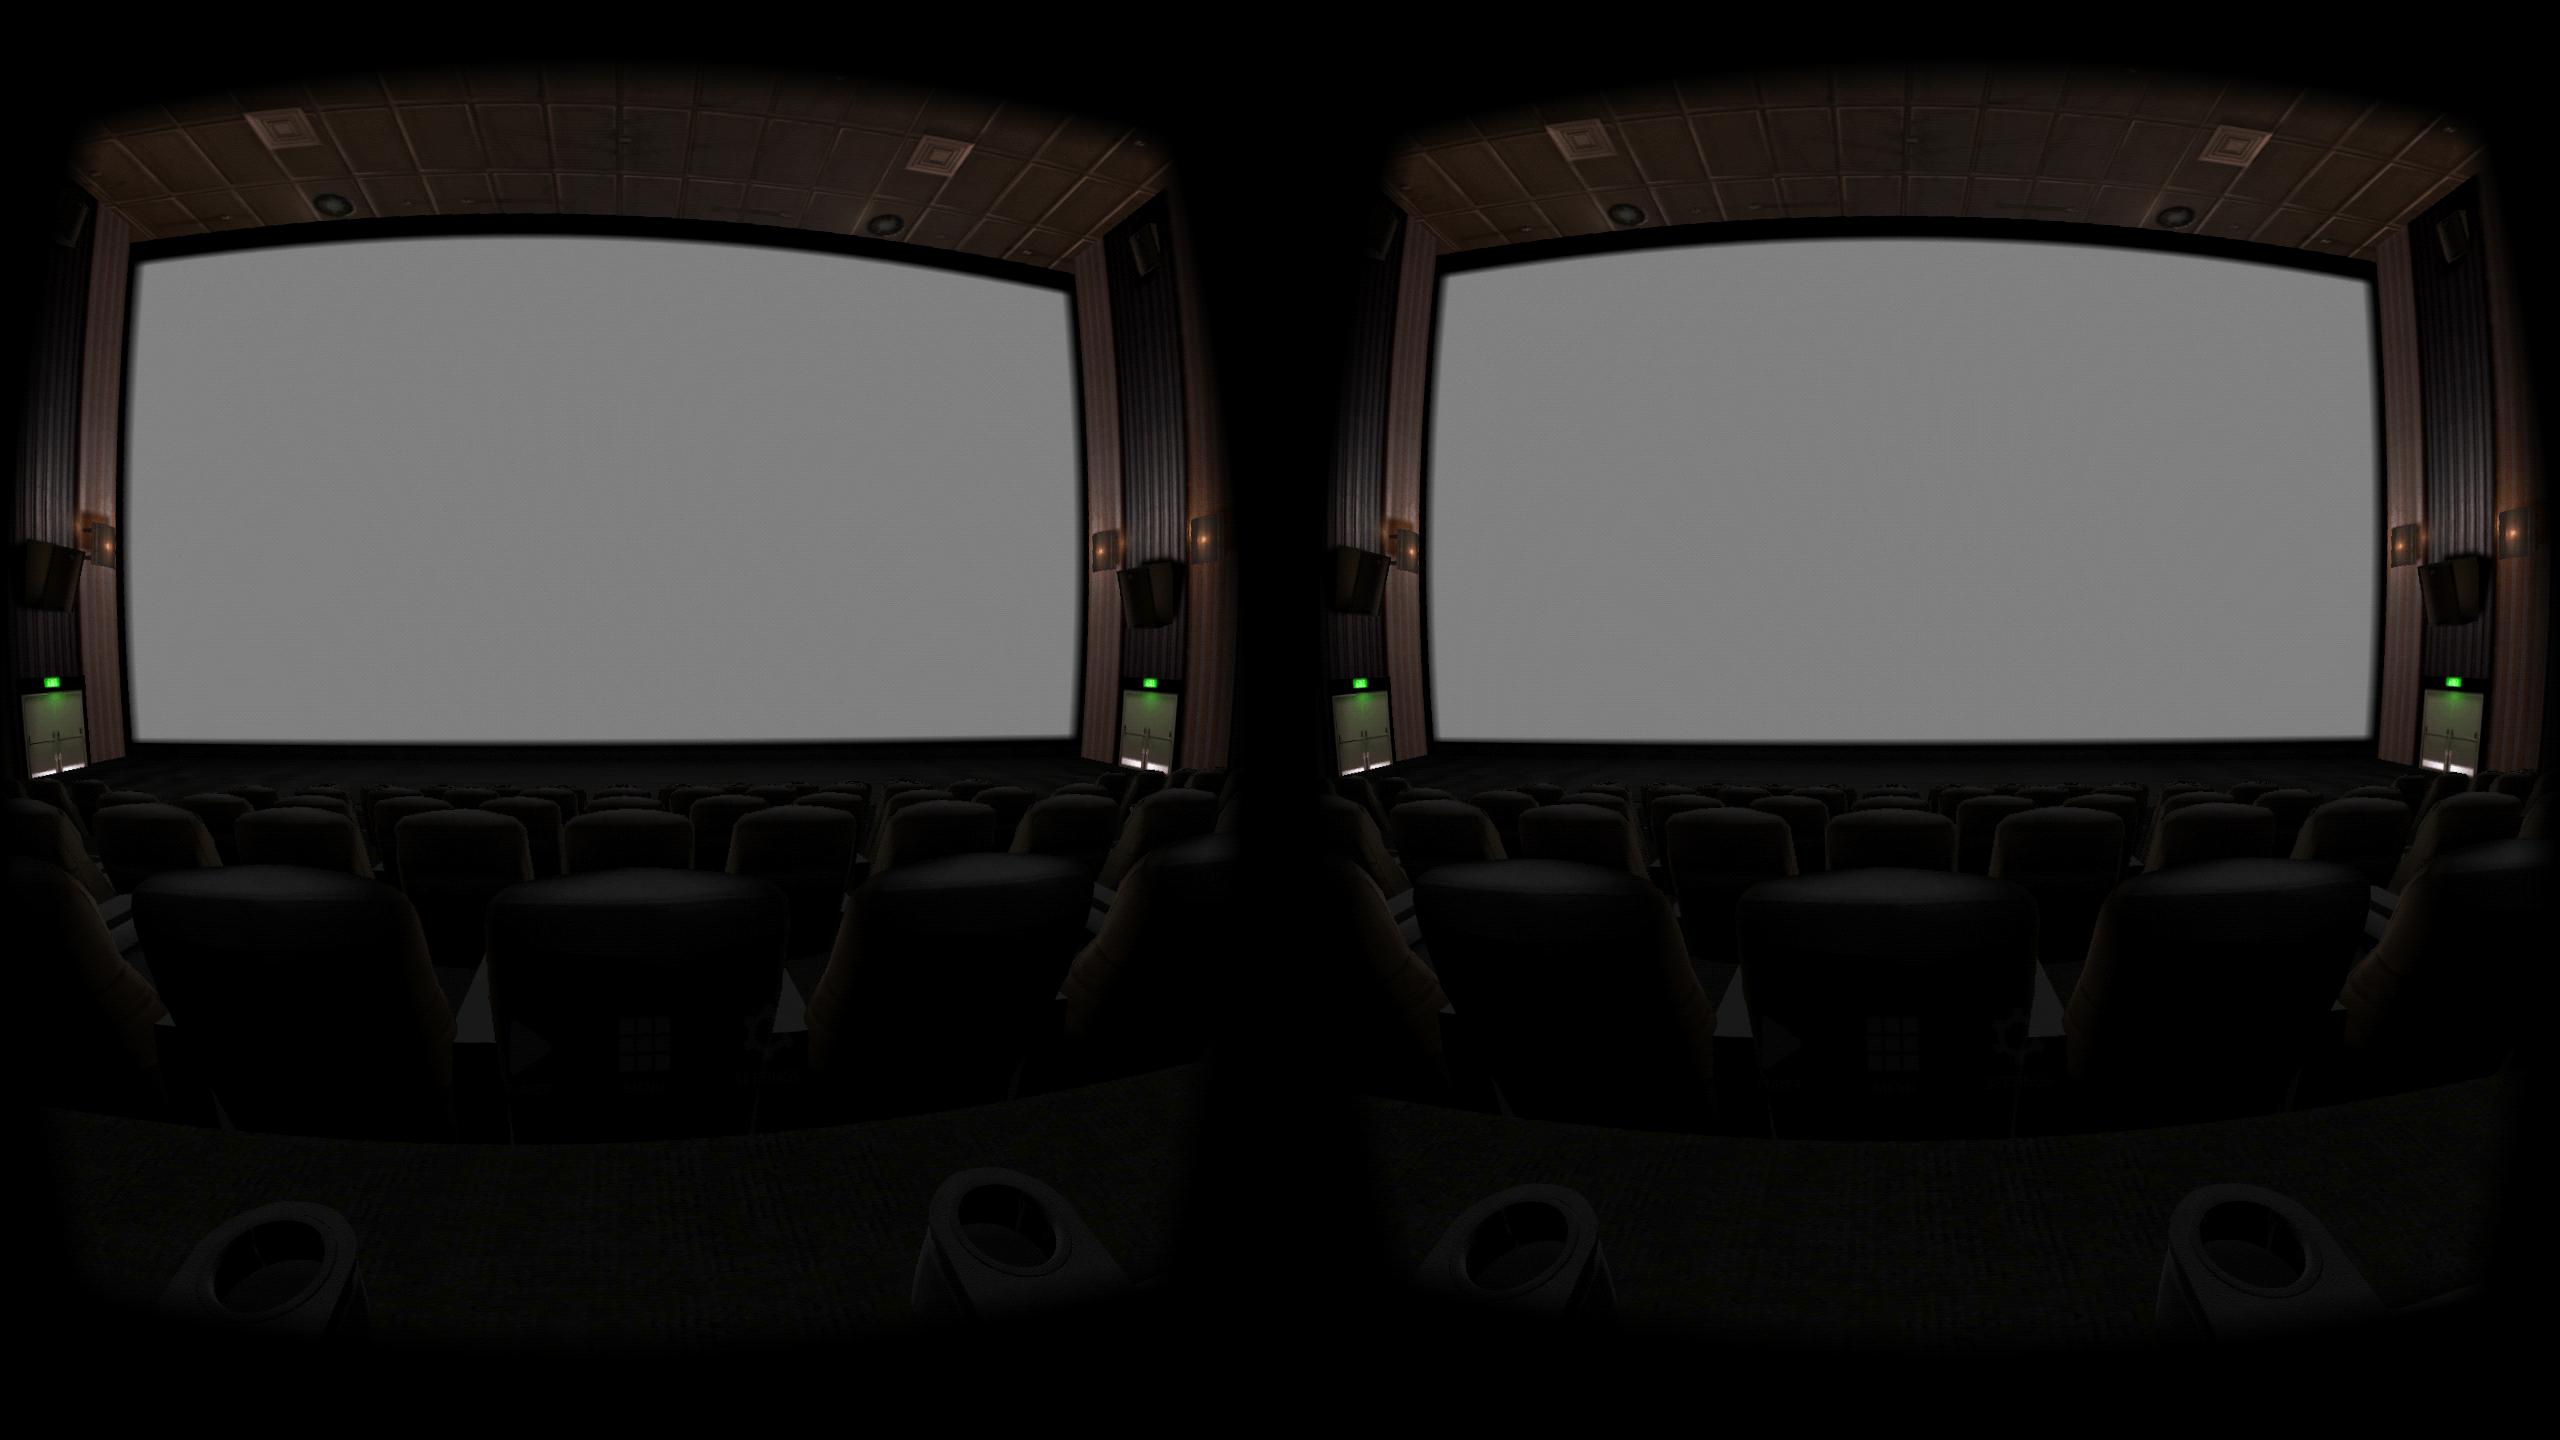 Cmoar VR Cinema 4